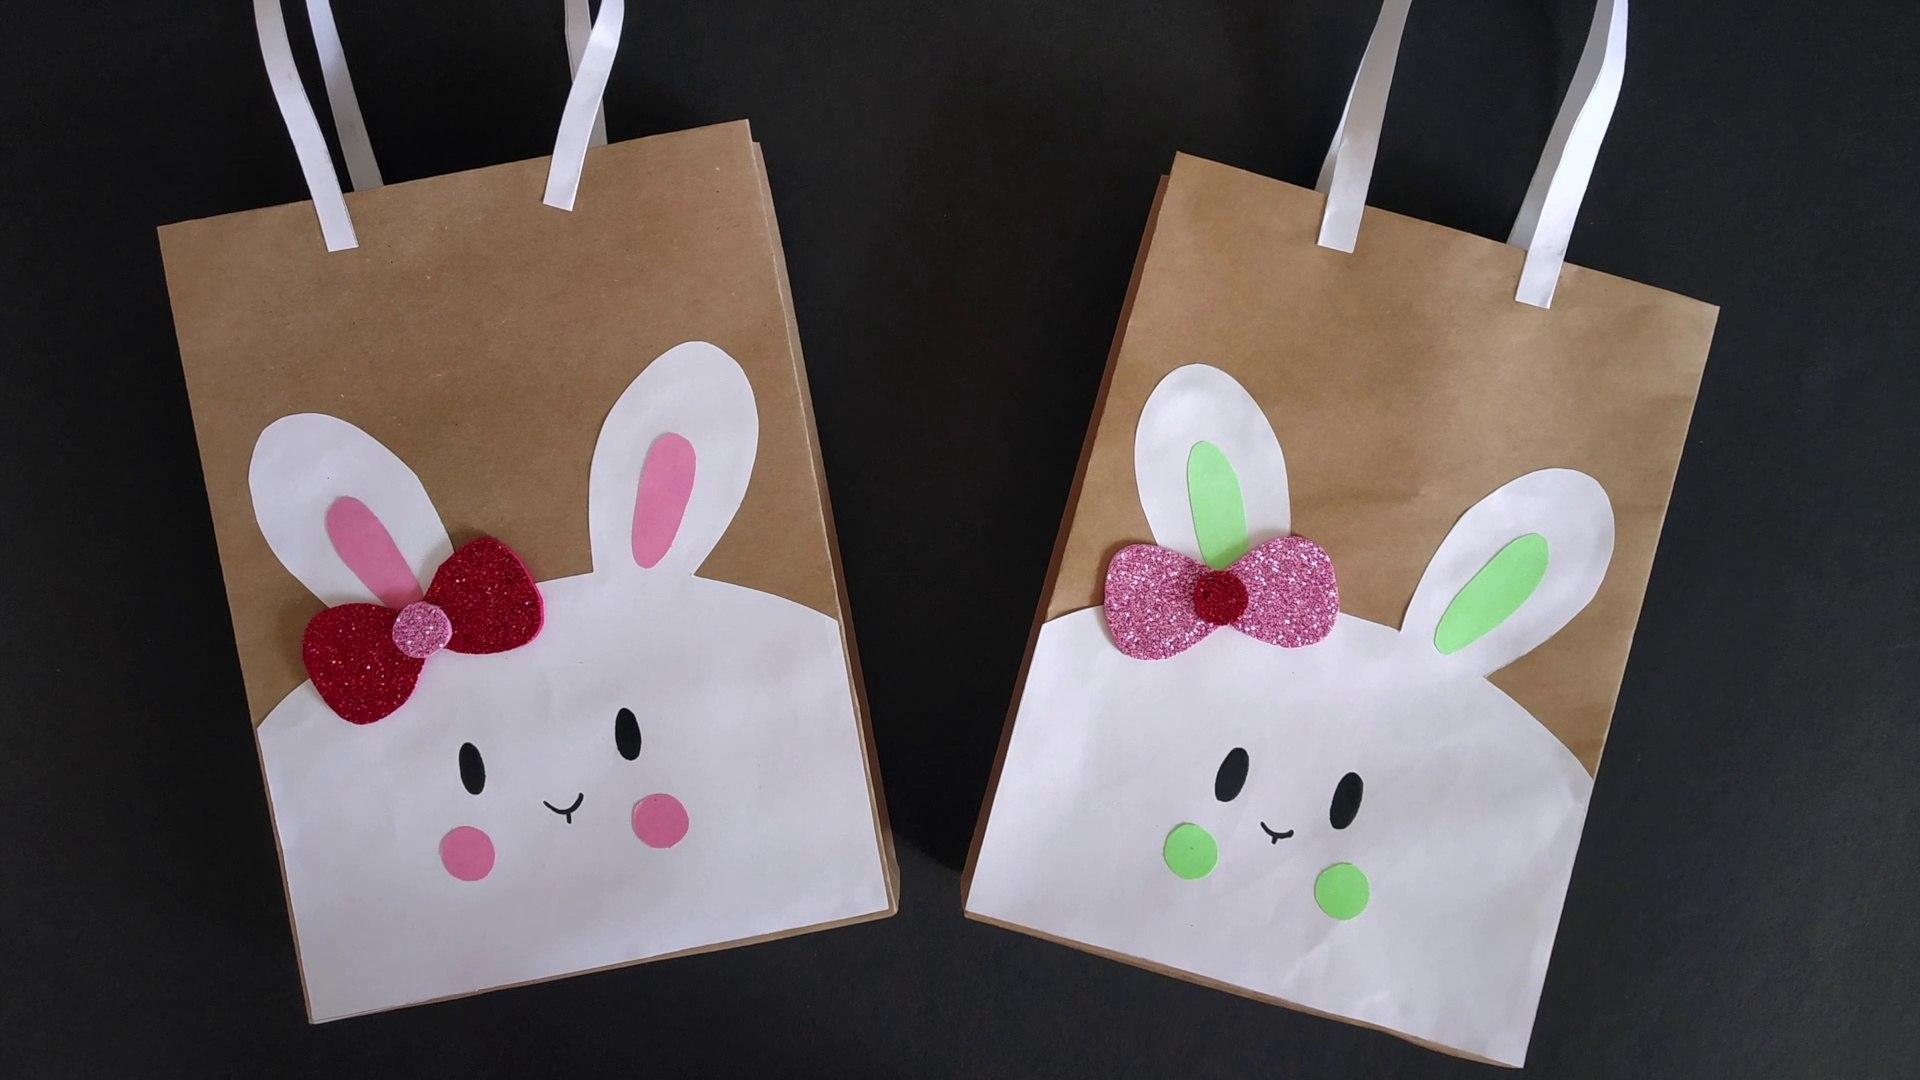 How to make a paper purse for girls | Easy origami handbag ... | 1080x1920